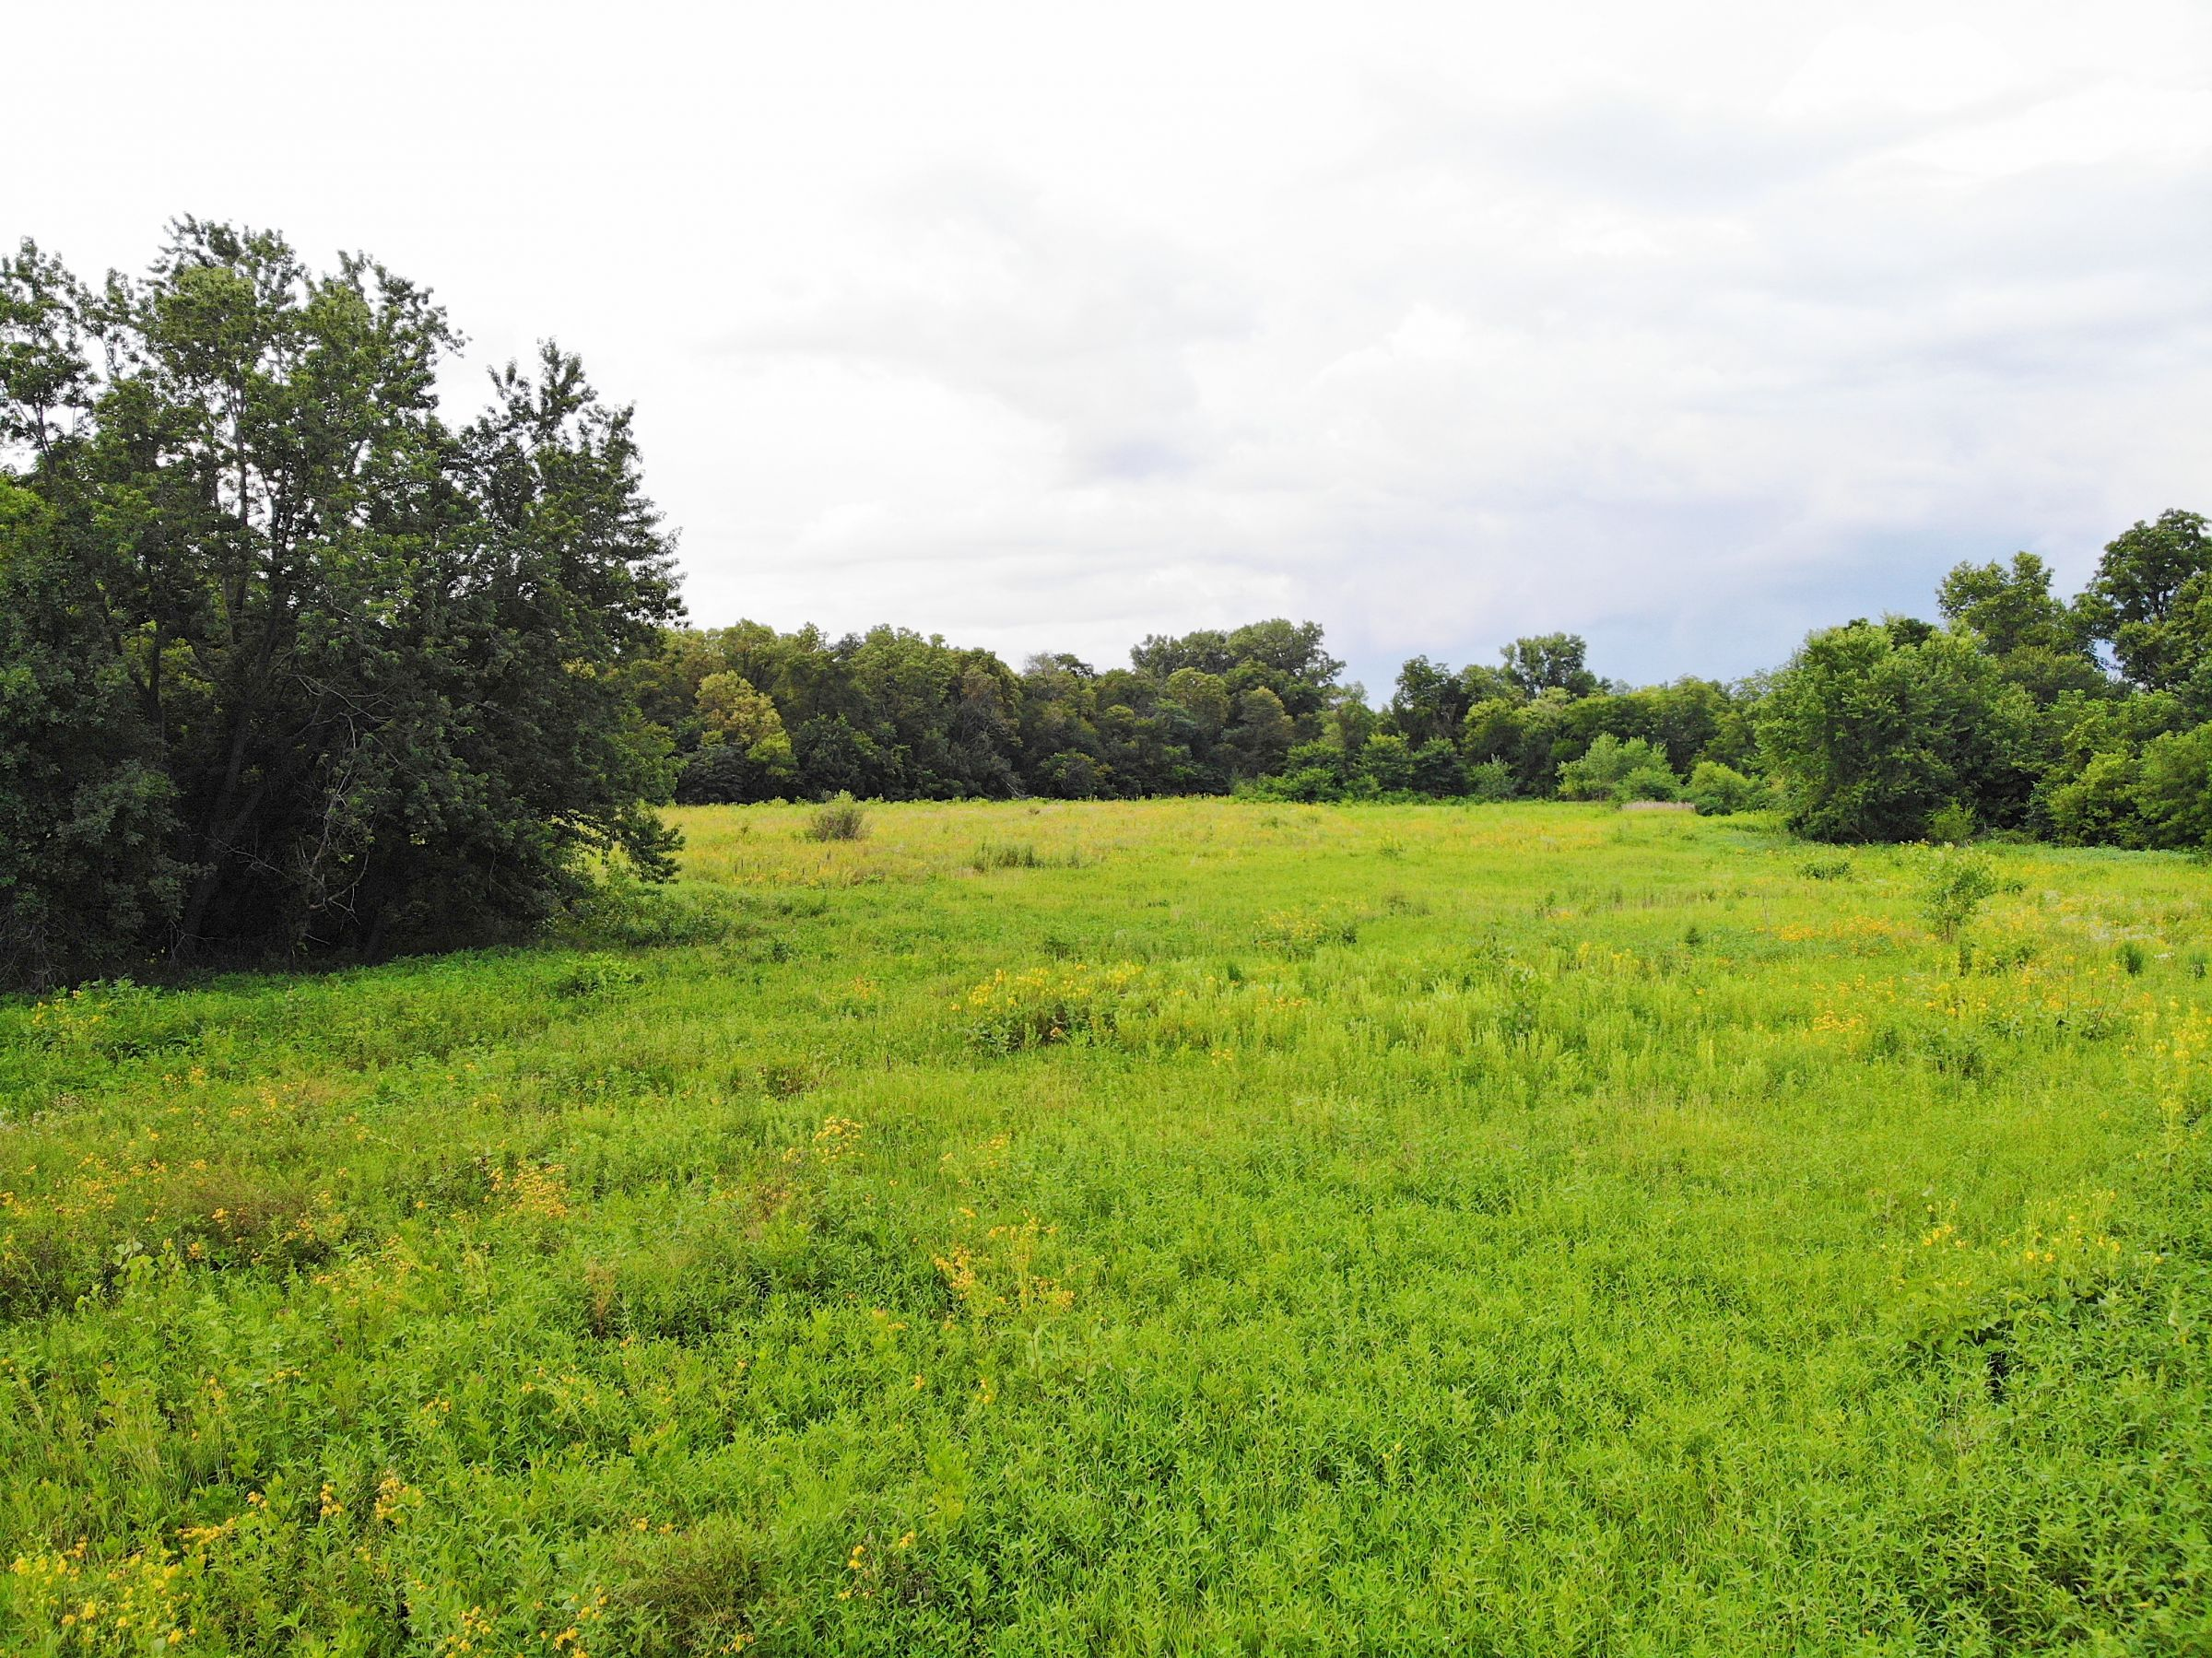 land-warren-county-iowa-38-acres-listing-number-15098-0-2020-08-01-153747.jpg